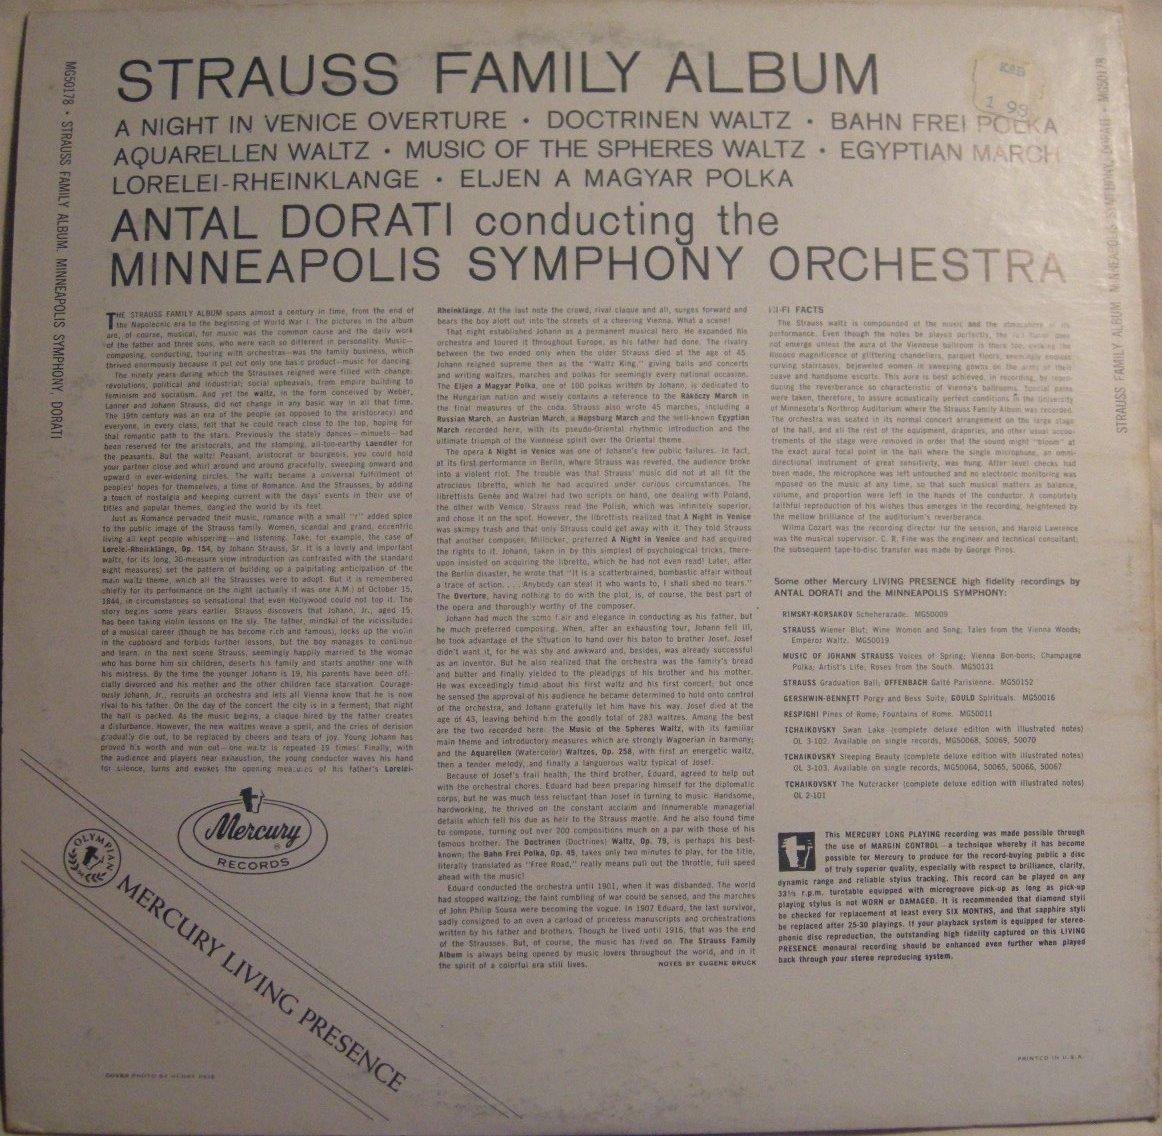 Strauss Family Cheap bargain Album Antal Minneapolis Dorati ...